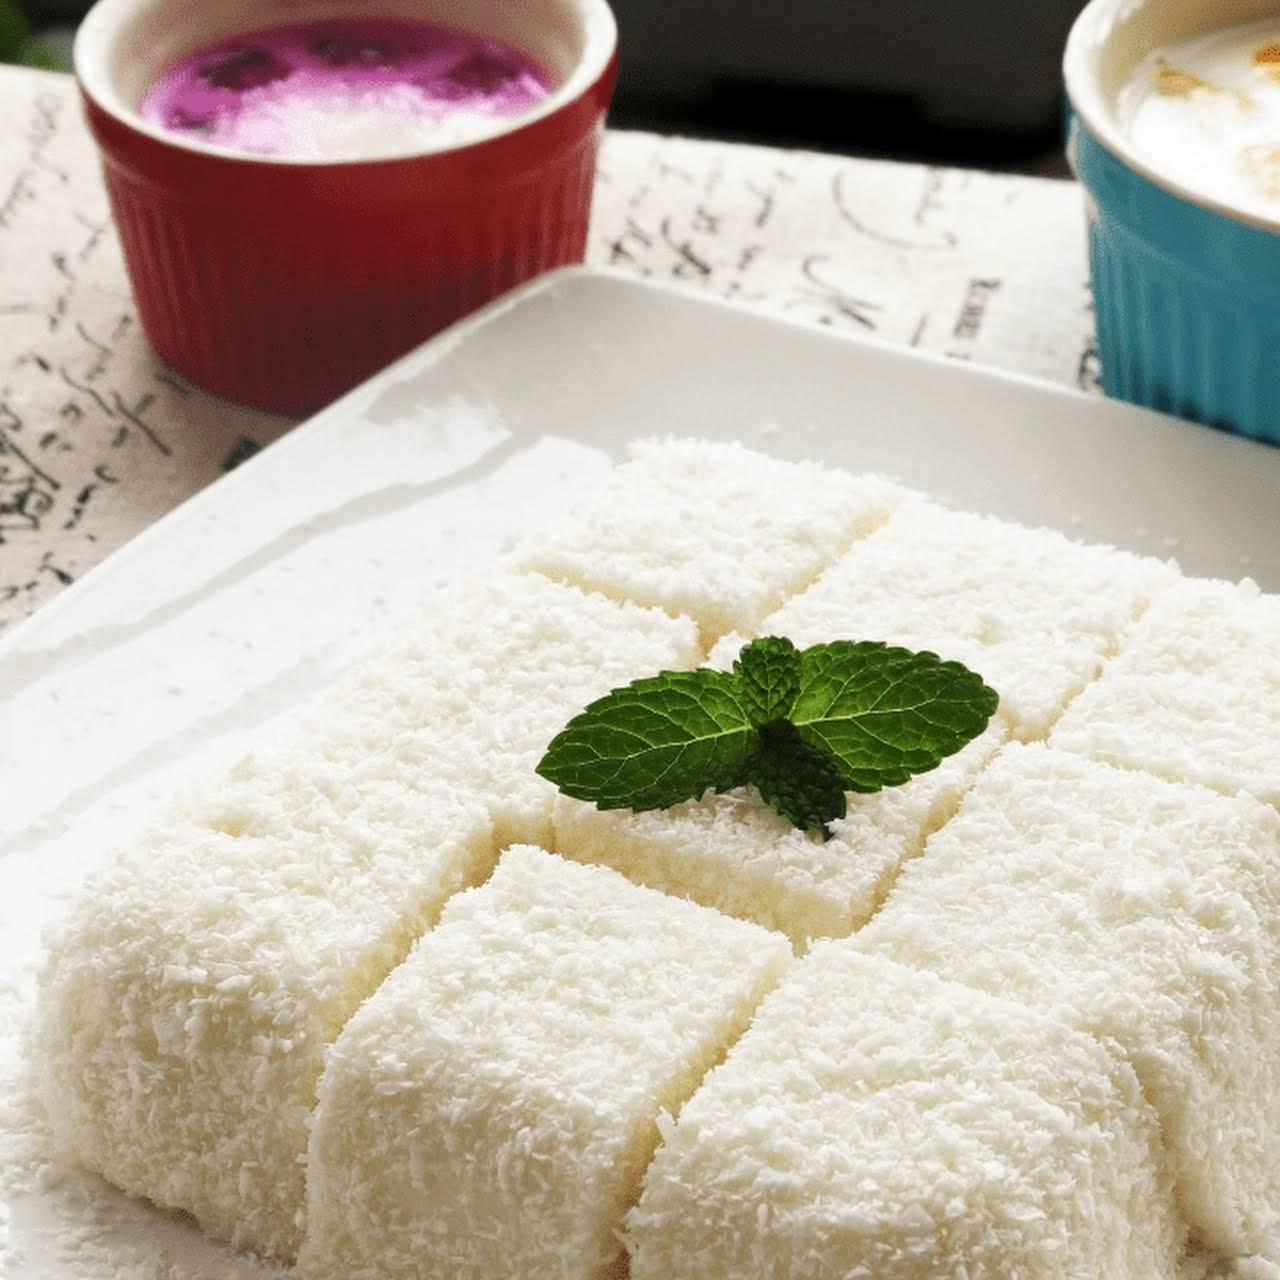 Coconut Jelly / Coconut Milk Pudding Dessert